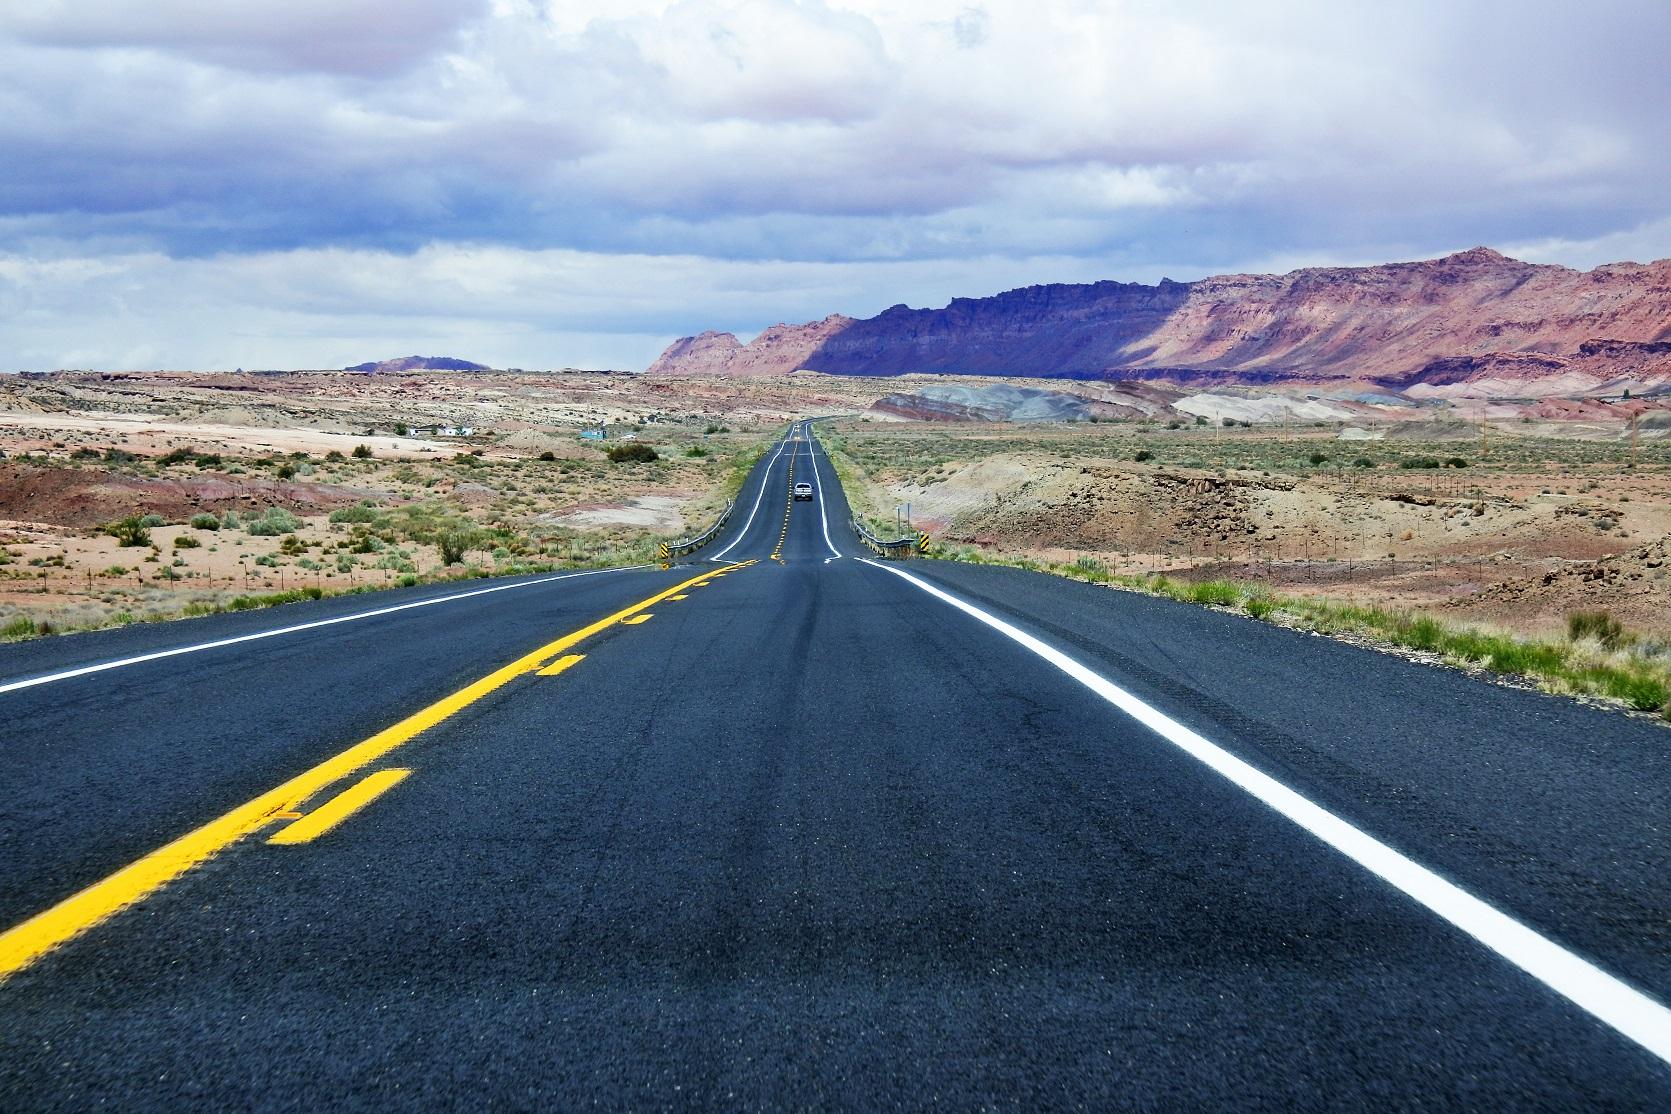 On the road in Arizona, USA